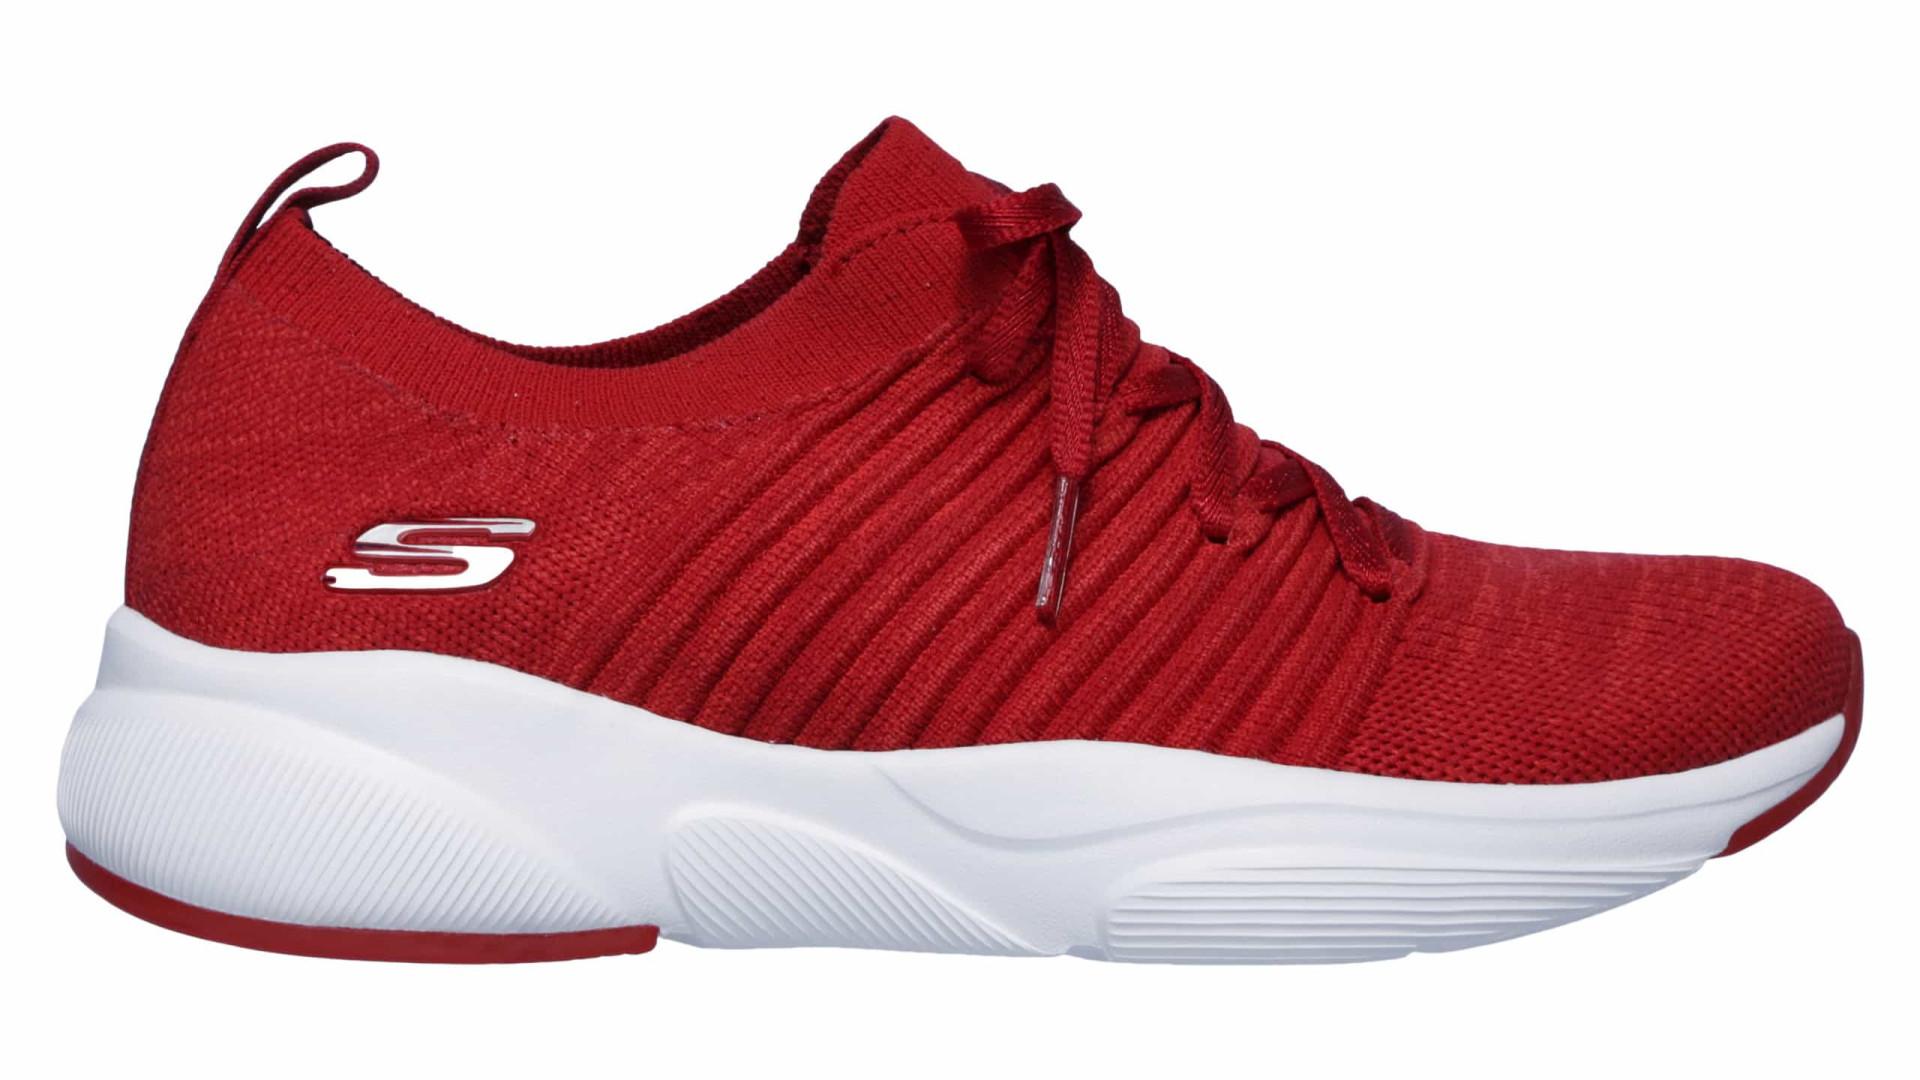 Skechers Athleisure: A tendência que salta do ginásio para a rua